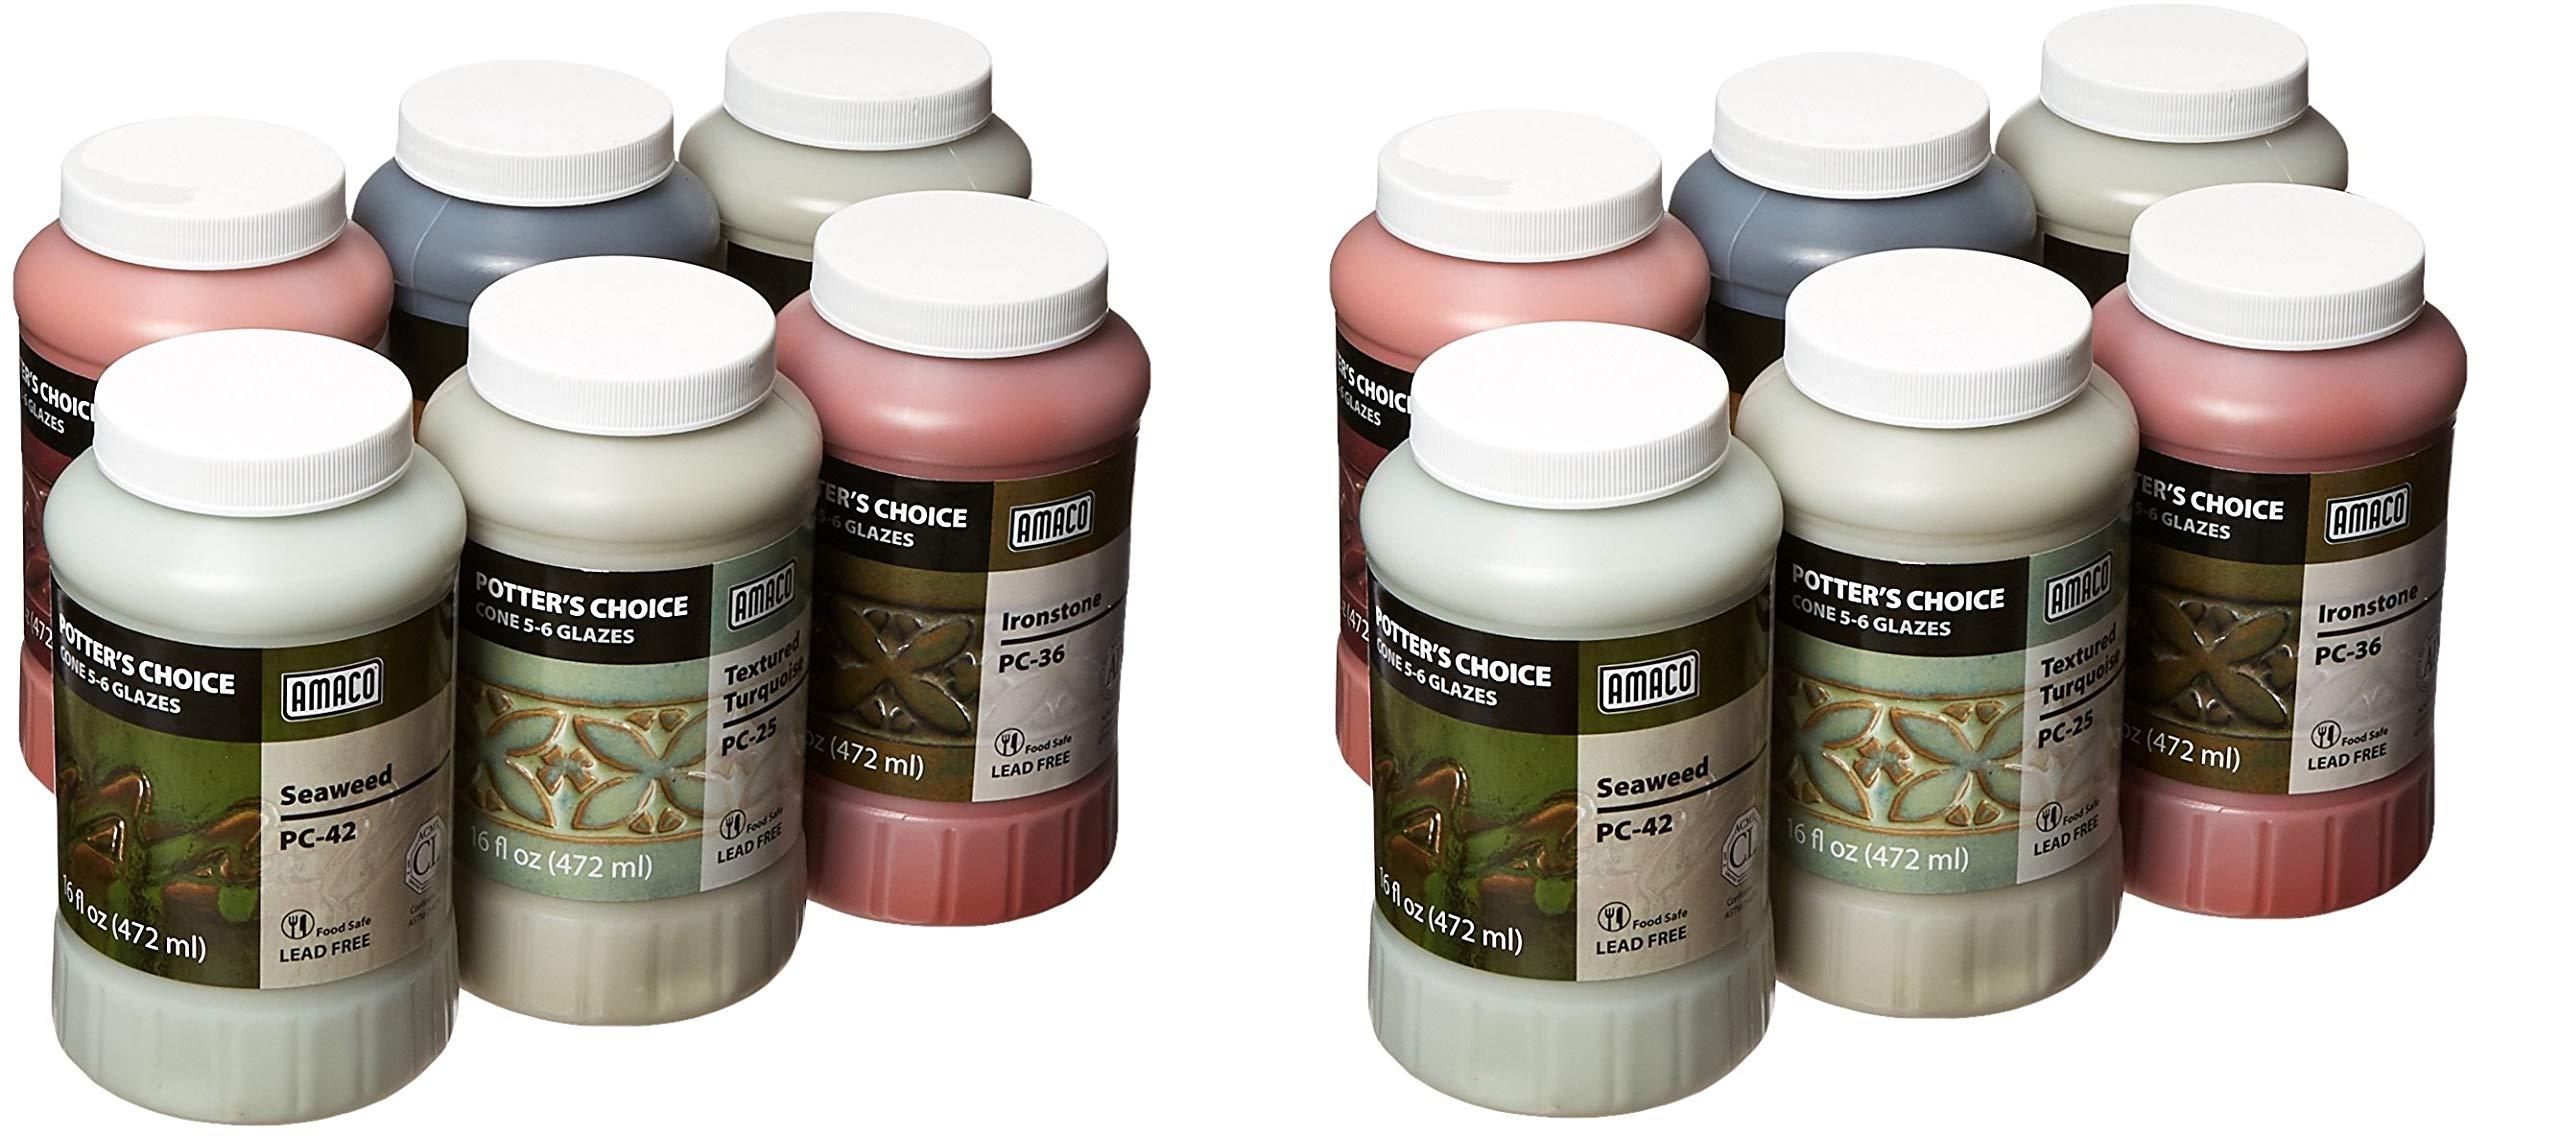 AMACO Potters Choice Lead-Free Glaze Set - B, 1 pt, Assorted Colors (2 X Pack of 6)